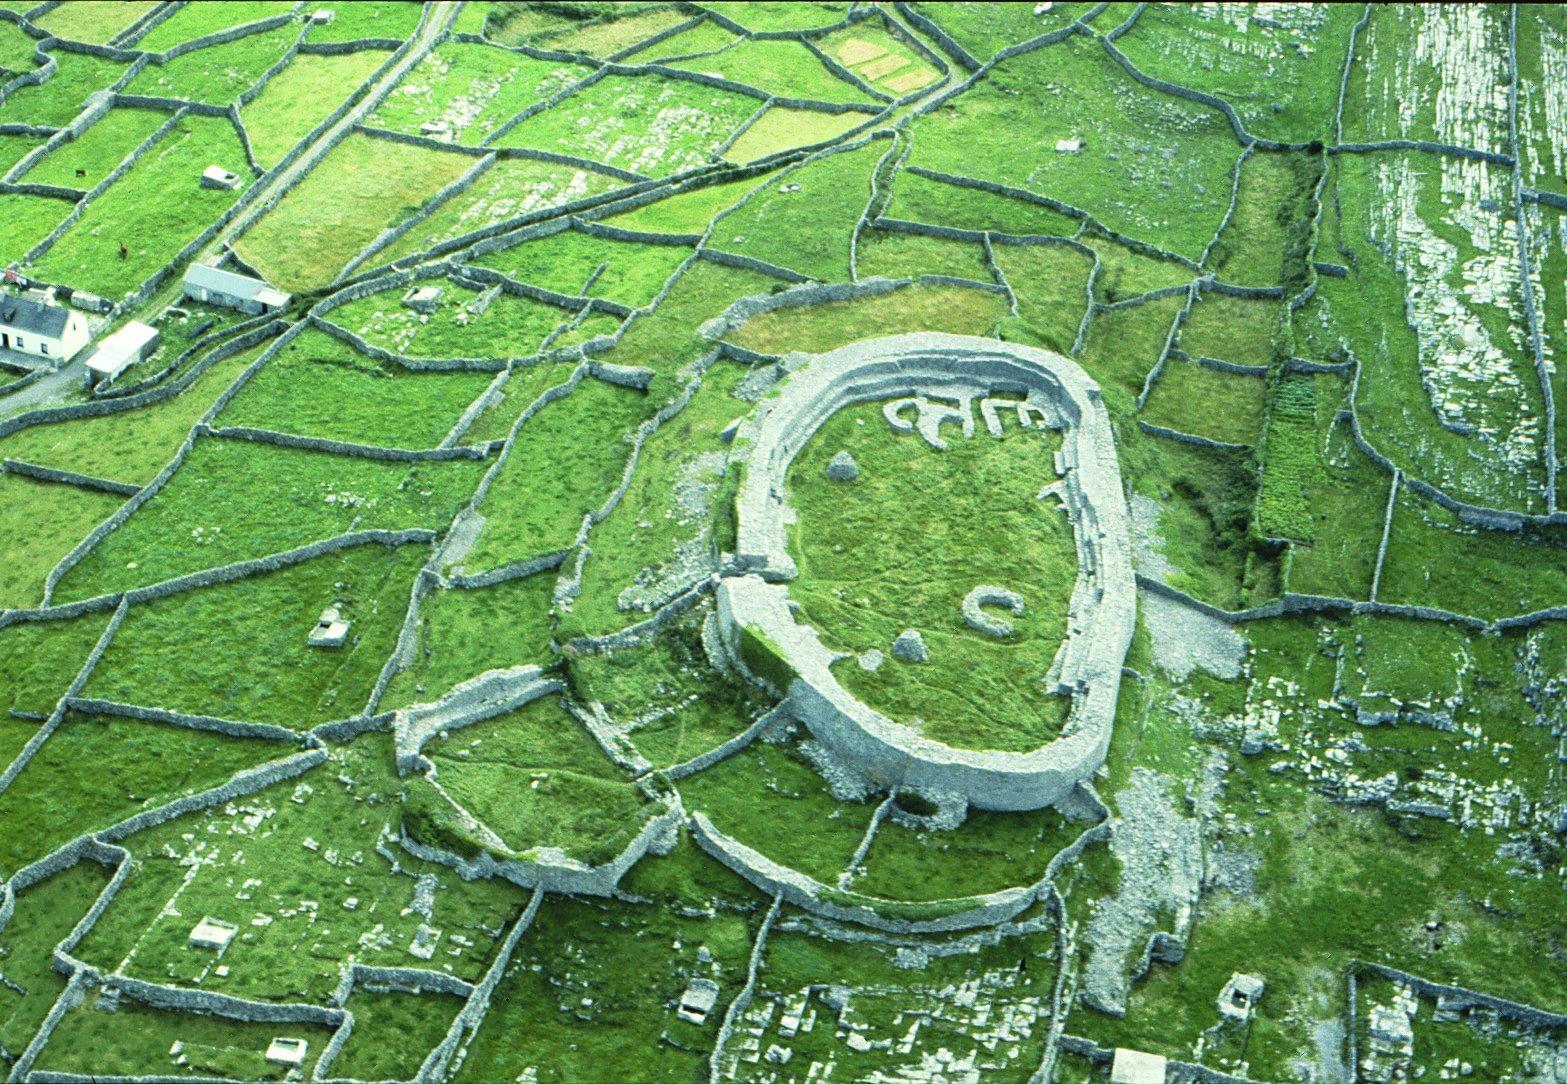 Dún Chonchuir Aerial Photo - Visit Galway